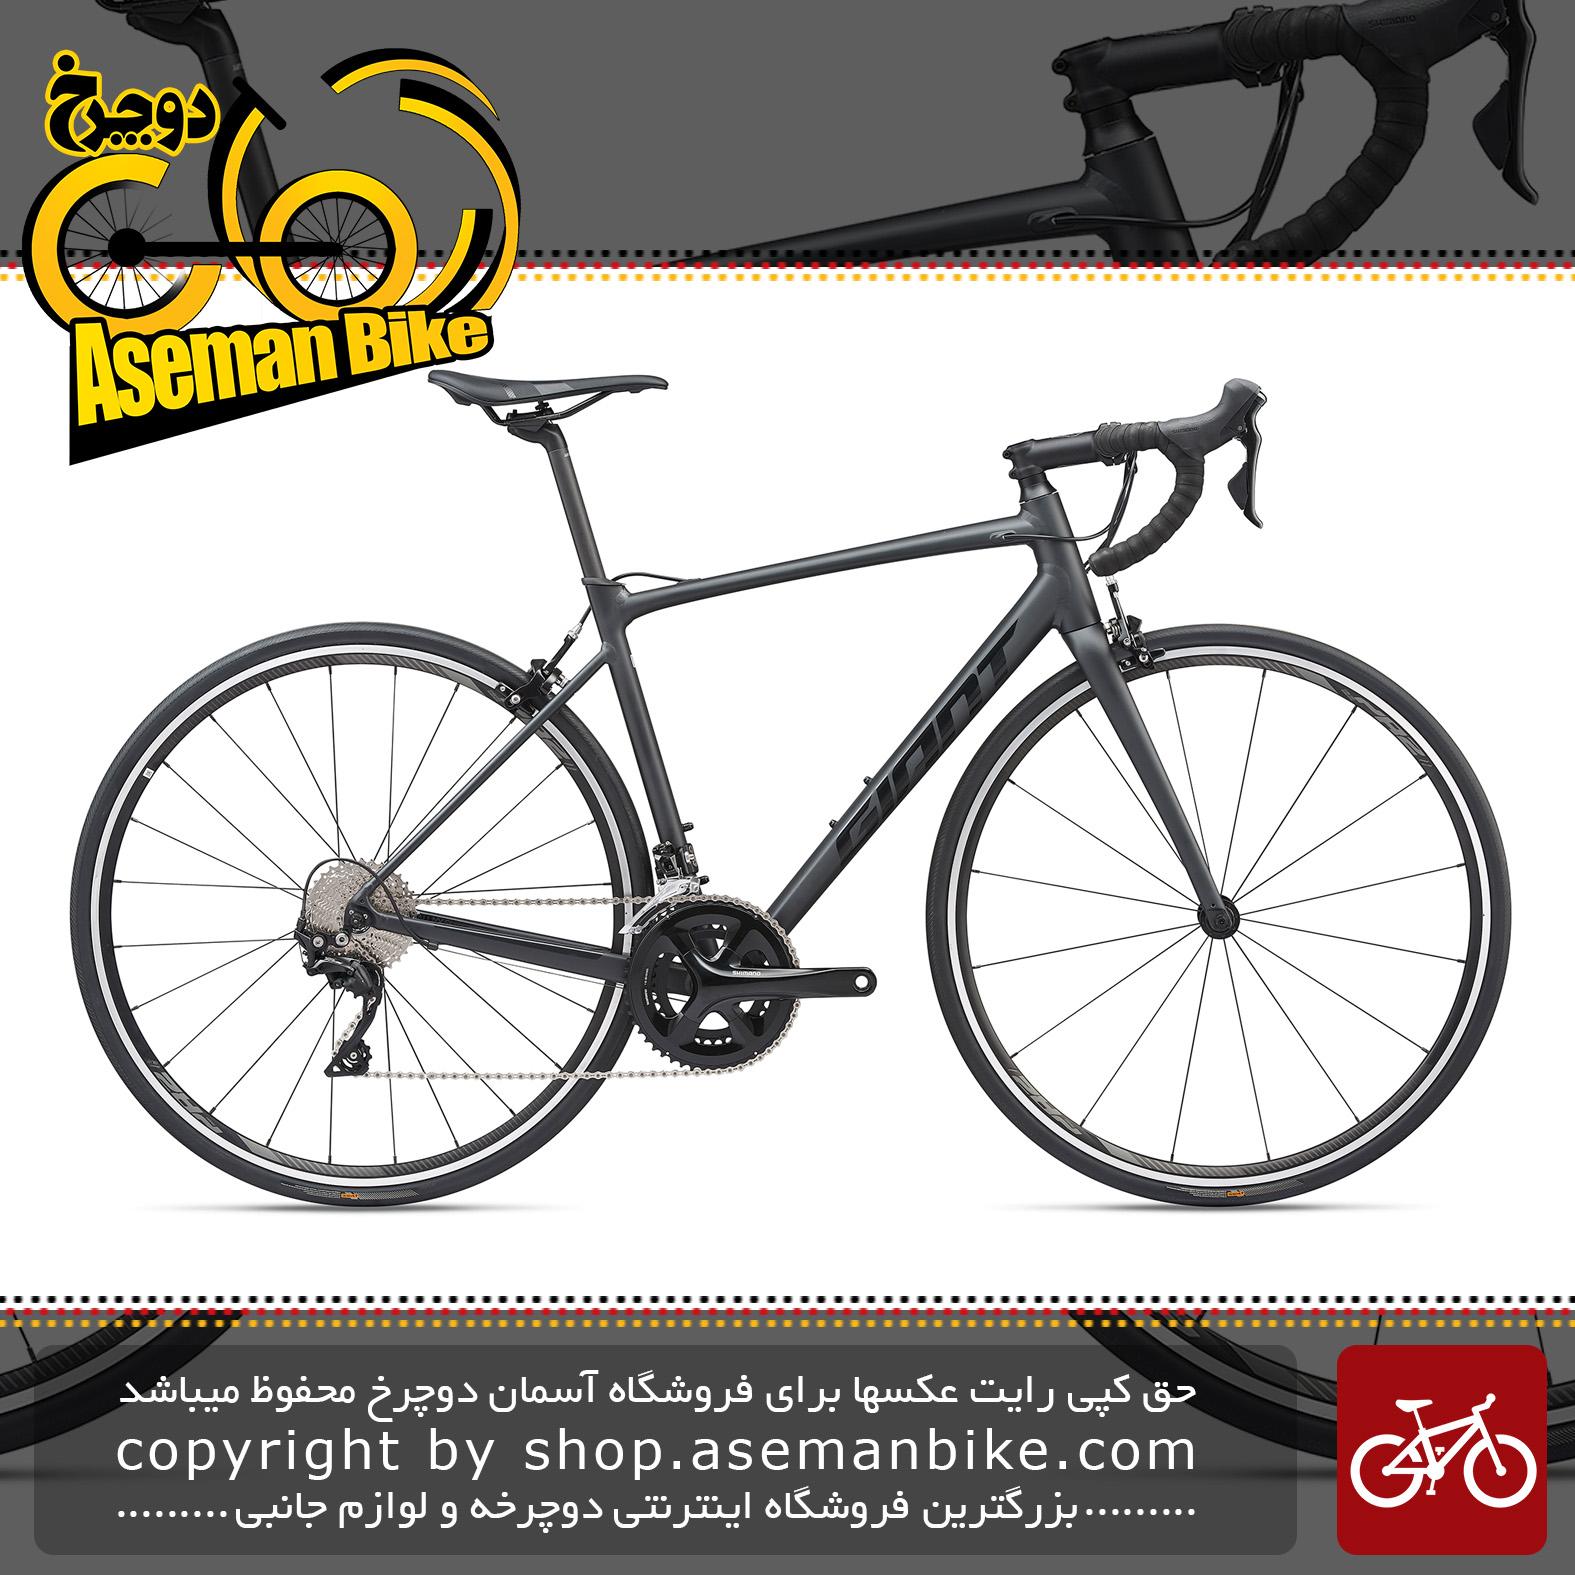 دوچرخه کورسی جاده جاینت مدل کانتند اس ال 1 (جی یو کی) 2020 Giant Road Bicycle Contend SL 1 (GUK) 2020